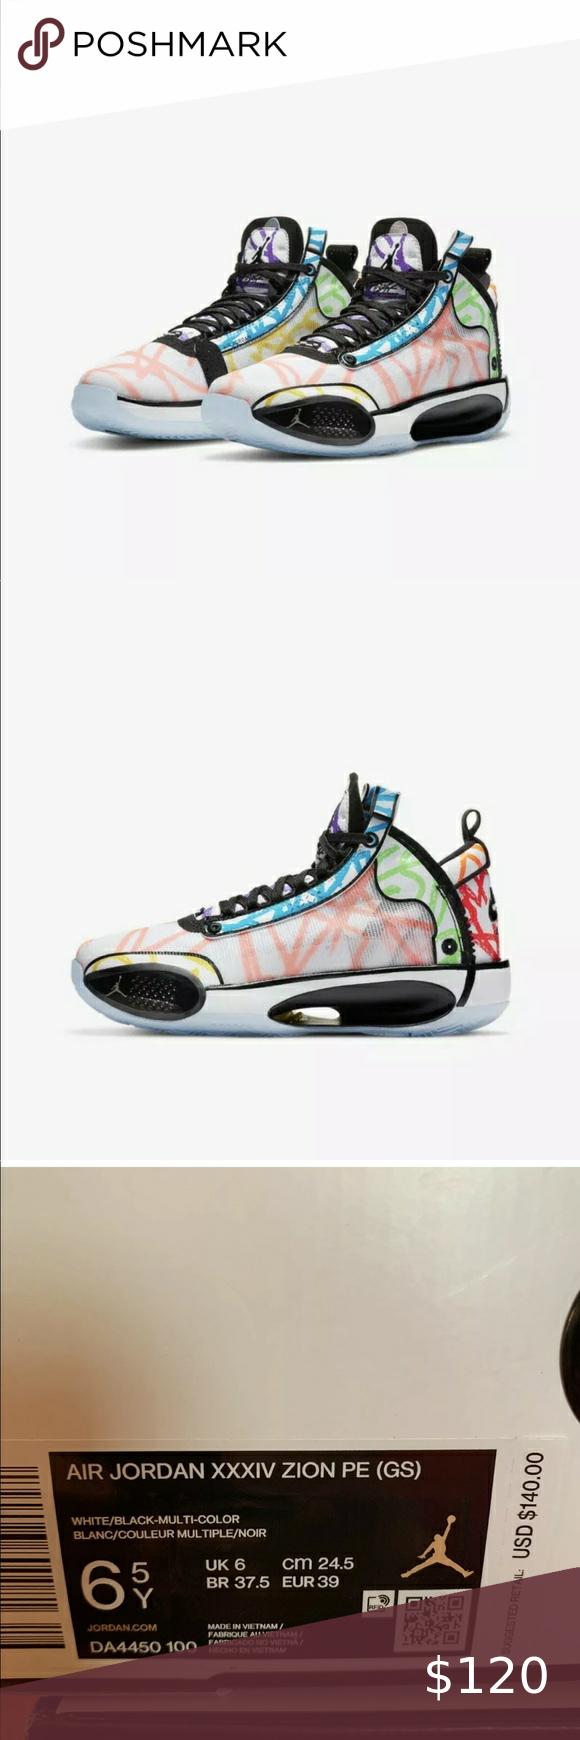 Nike Air Jordan Xxxiv 34 Zion Williamson Pe Nike Air Jordan Xxxiv 34 Zion Williamson Pe Coloring Book Da4450 100 M6 5y W8 Air Jordans Nike Air Jordan Nike Air